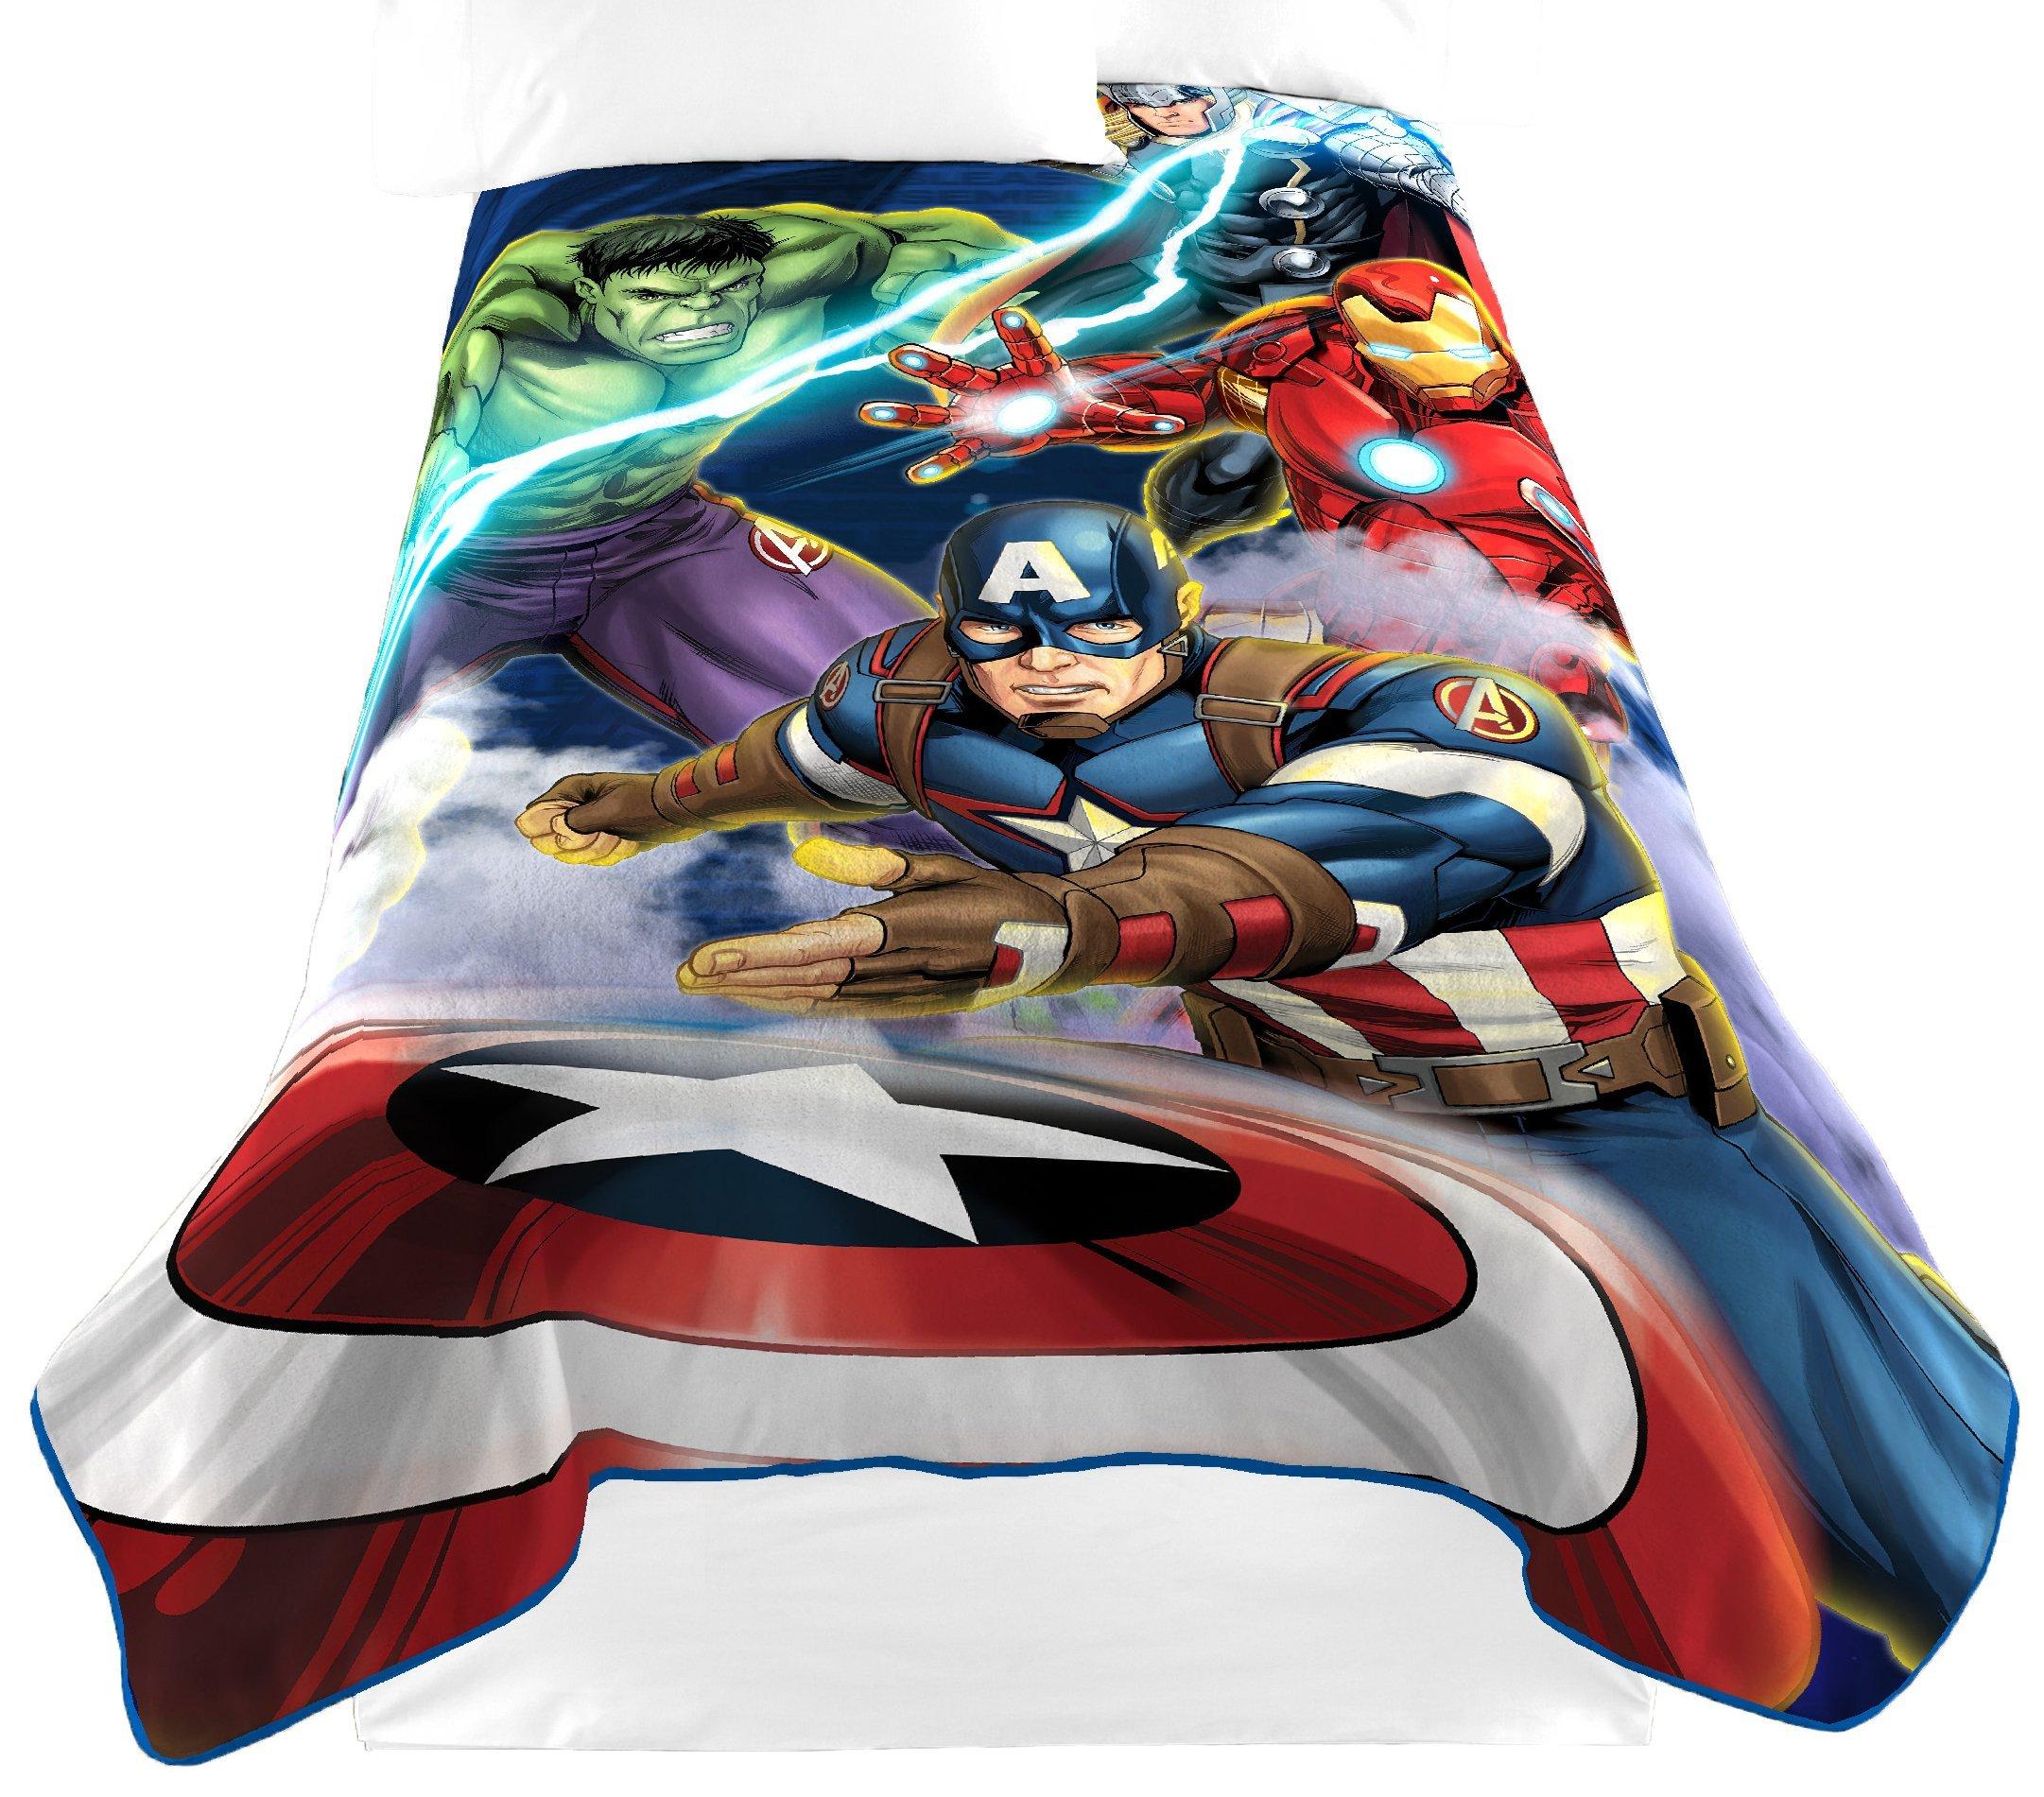 Marvel Avengers Blue Circle Fleece Plush Blanket, 62 x 90/Twin by Jay Franco